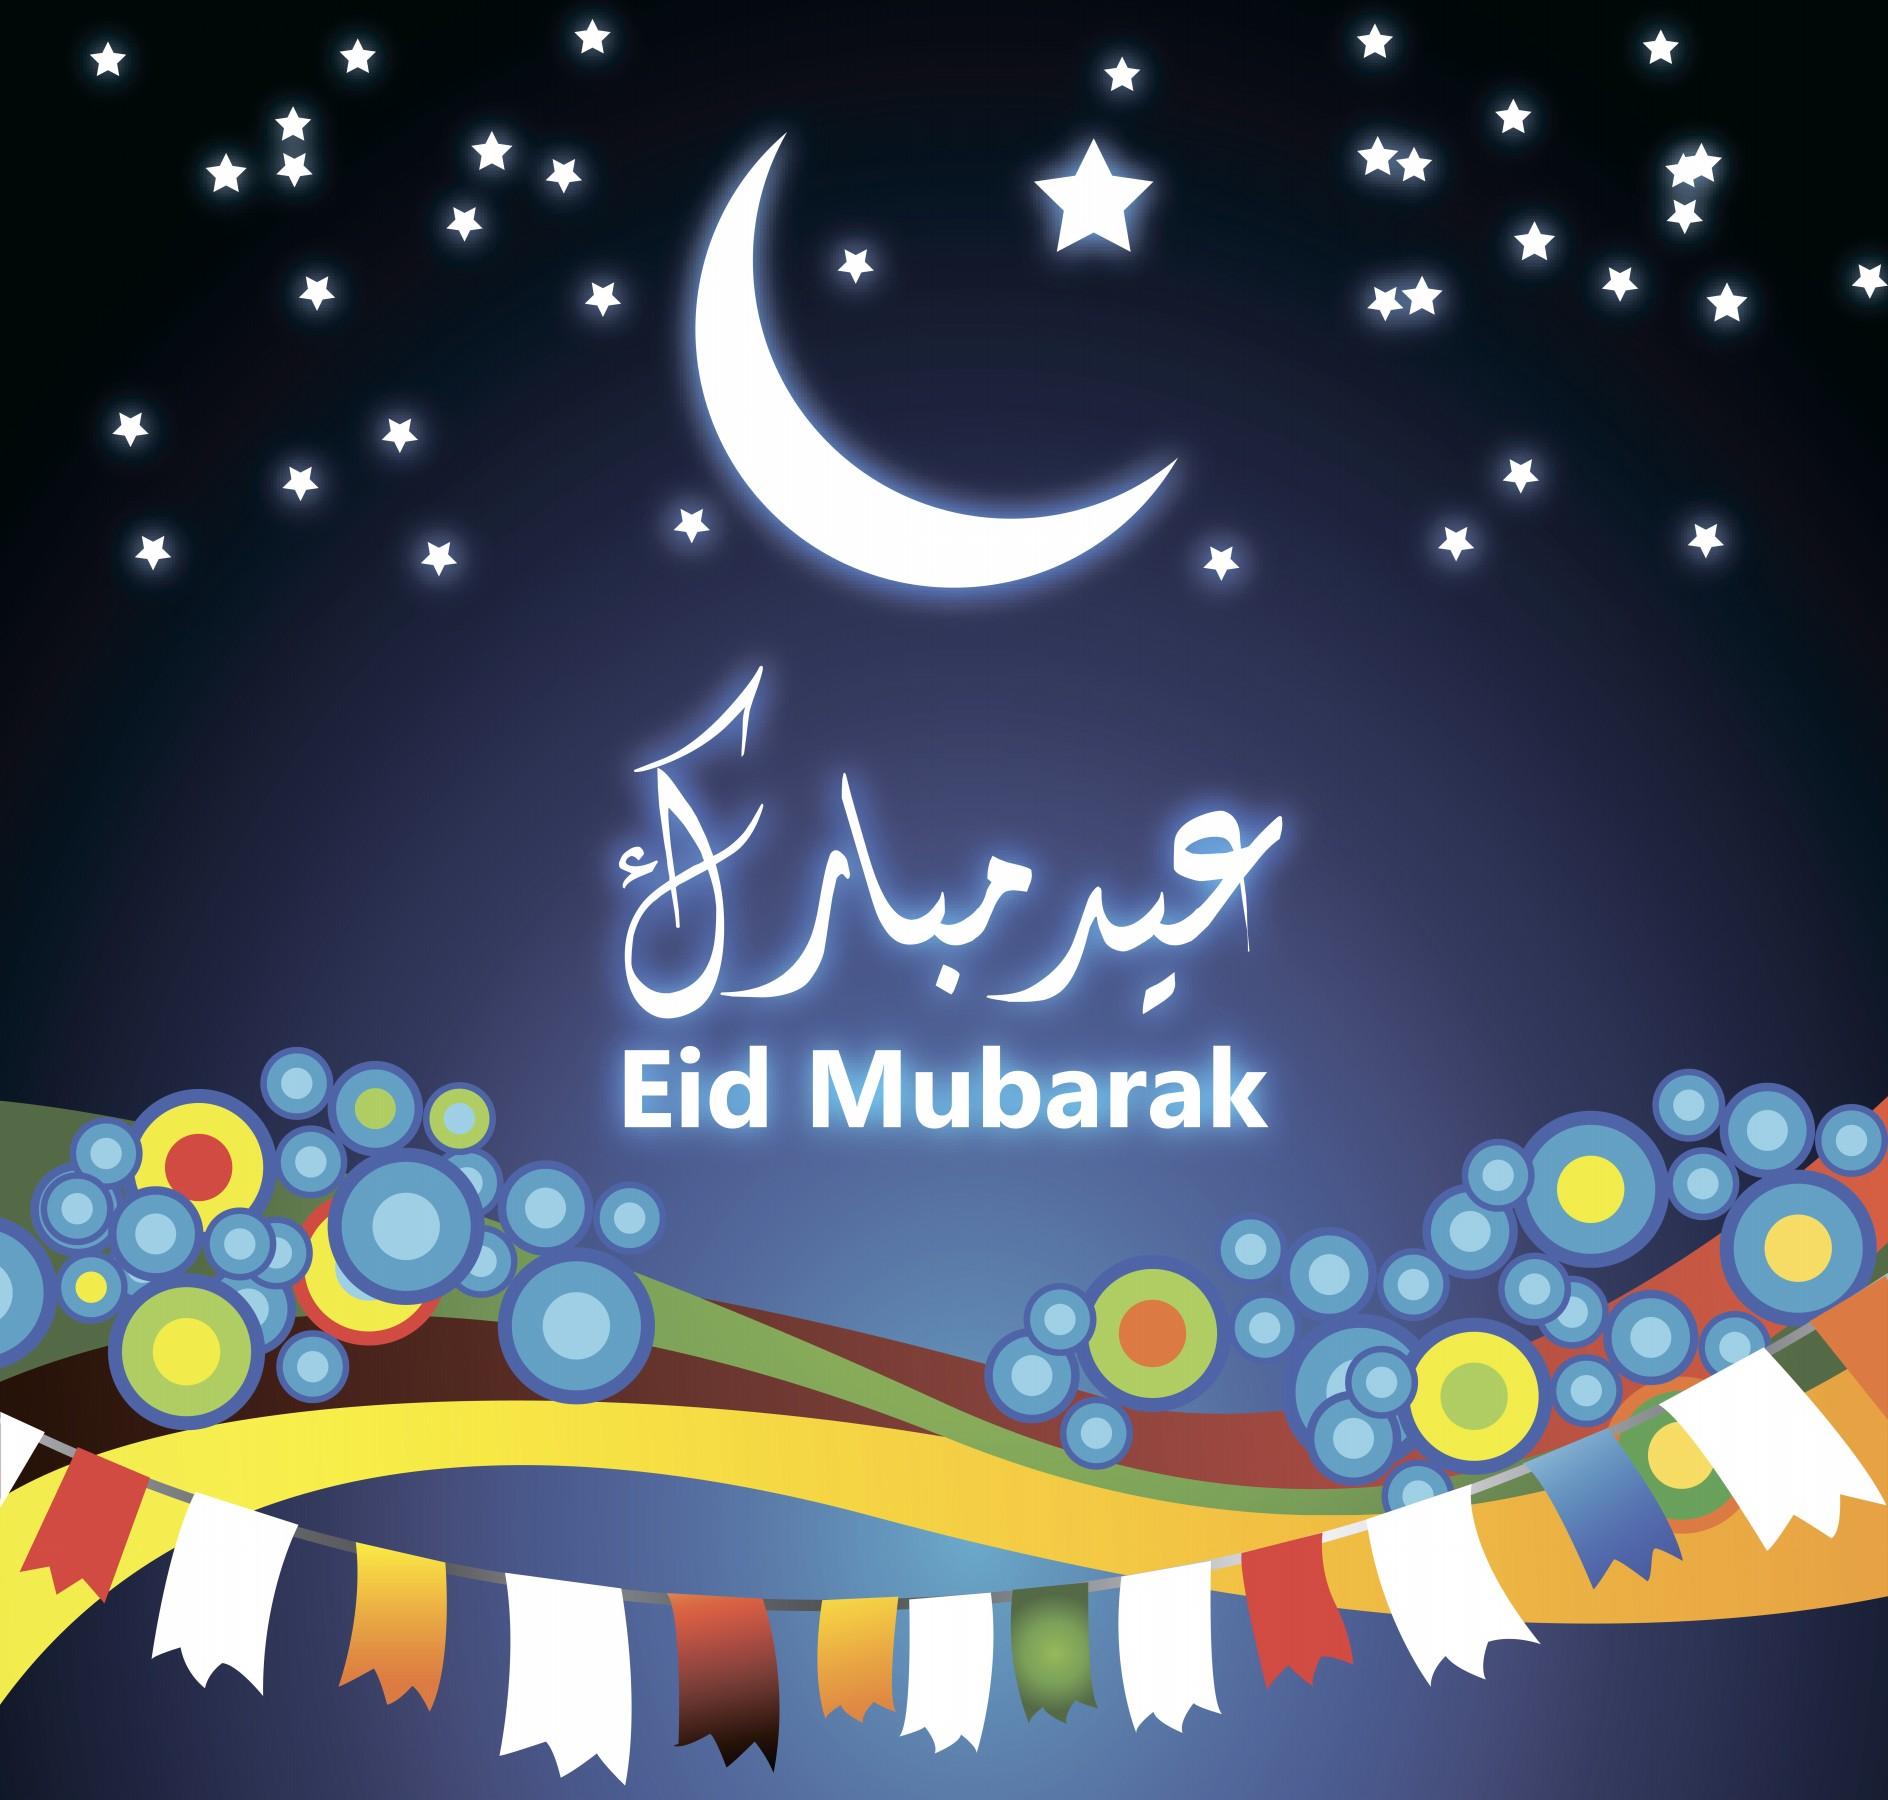 Wallpaper download eid - Eid Mubarak Wallpapers Images Cards 1